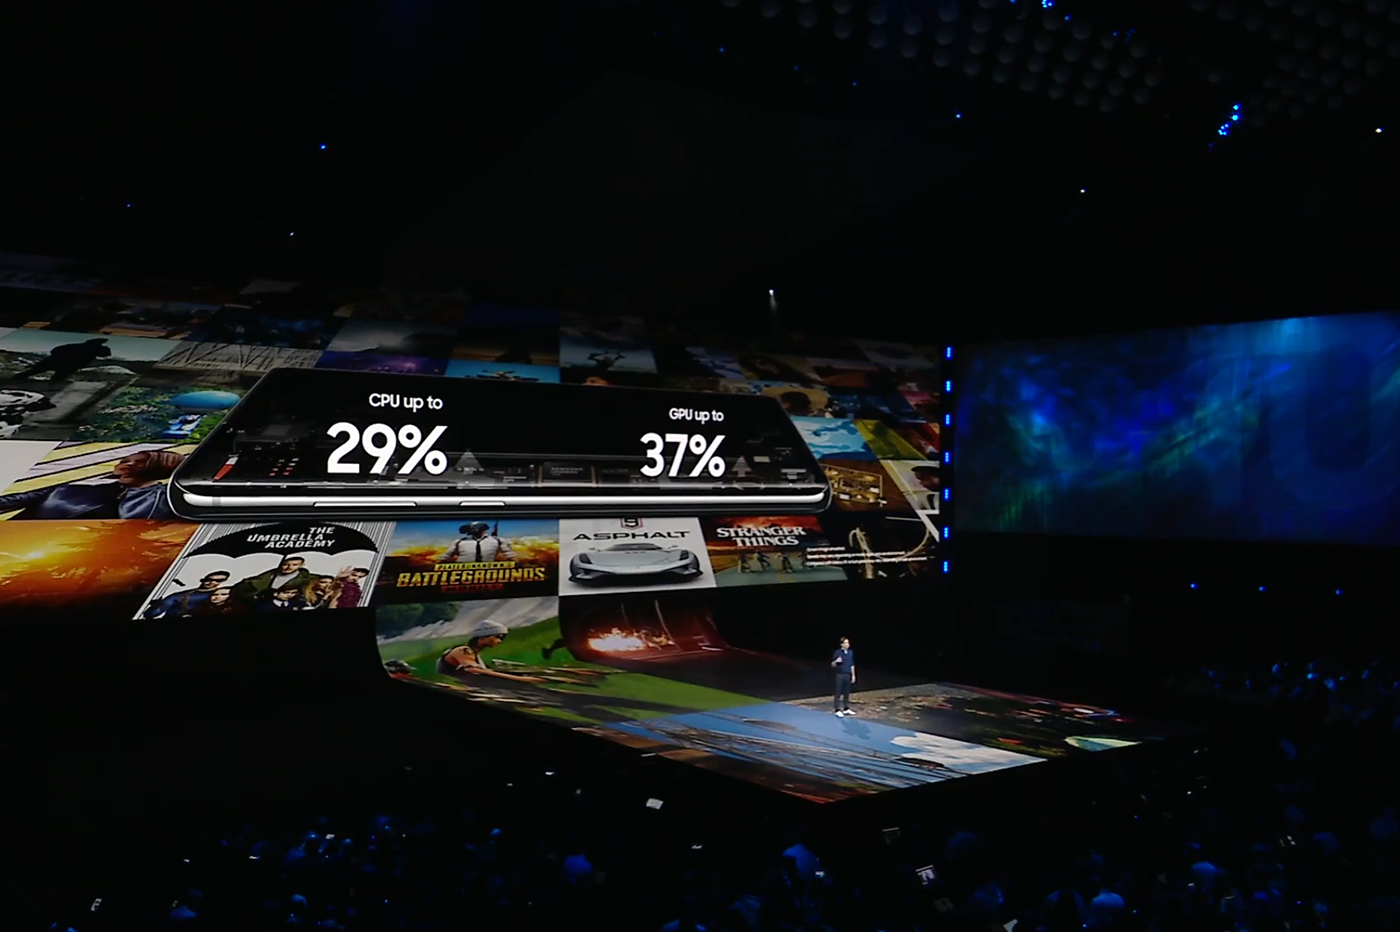 Samsung Galaxy S10 GPU